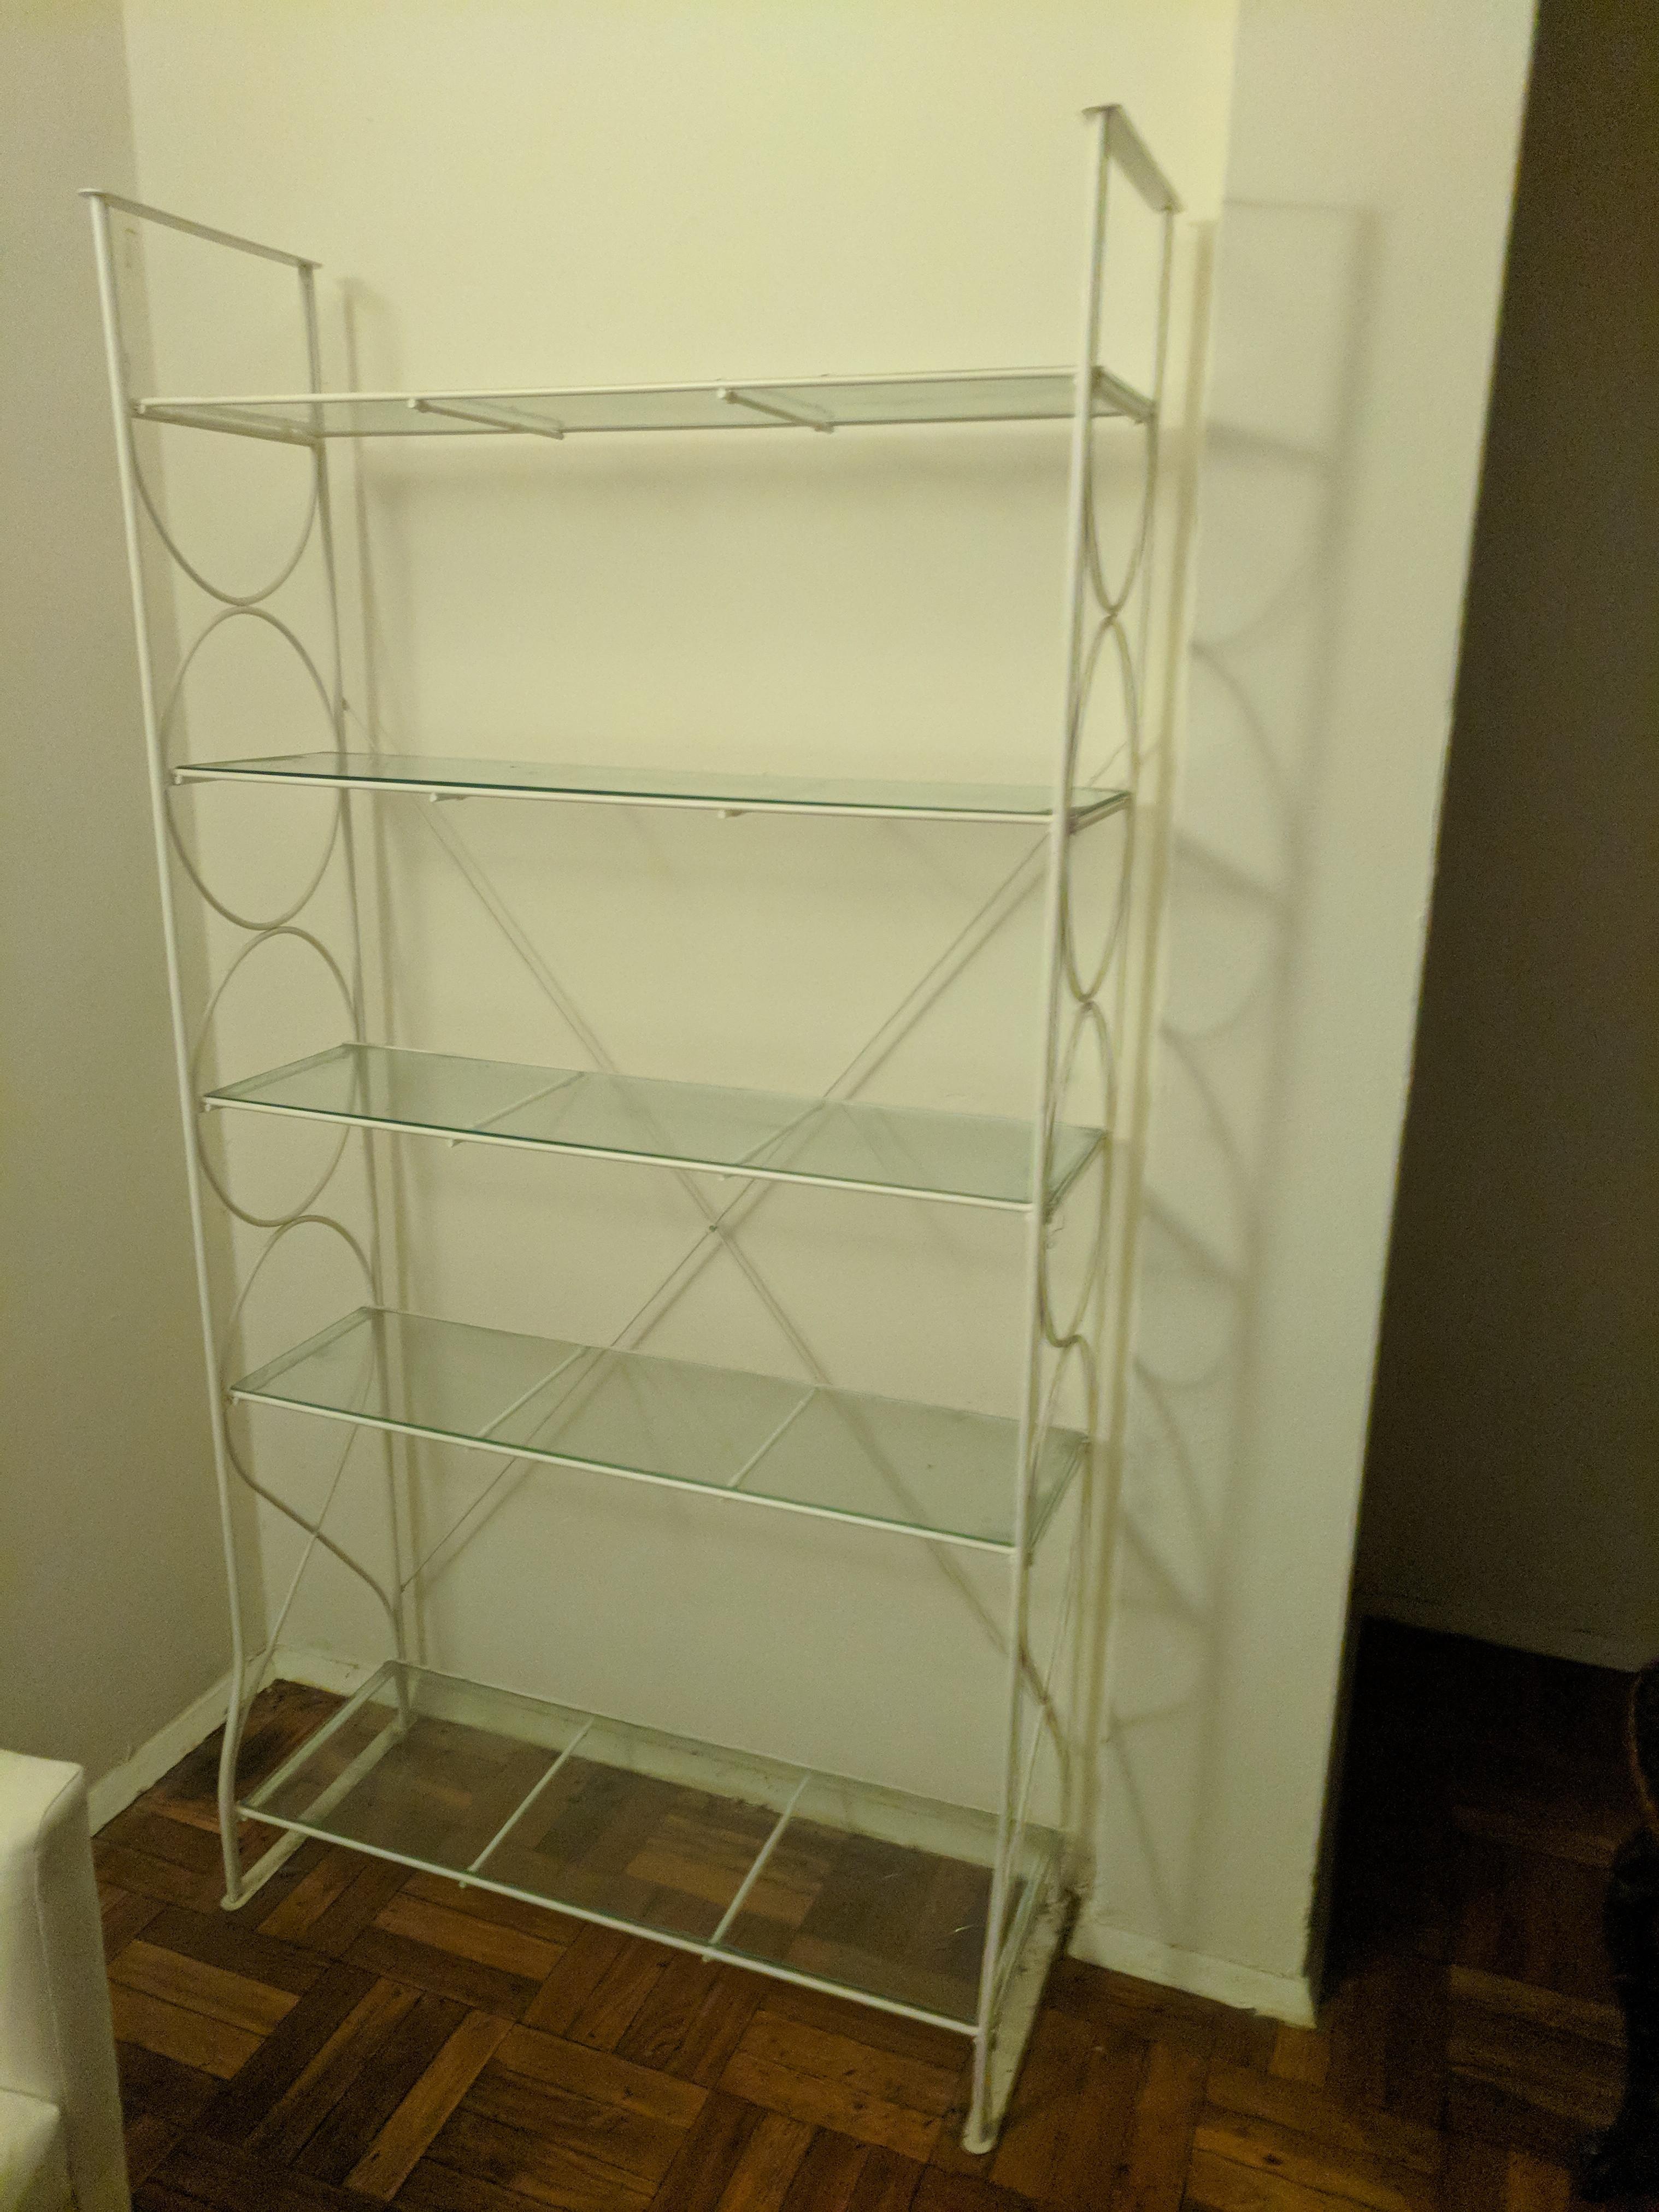 Ikea White & Glass Shelving Unit